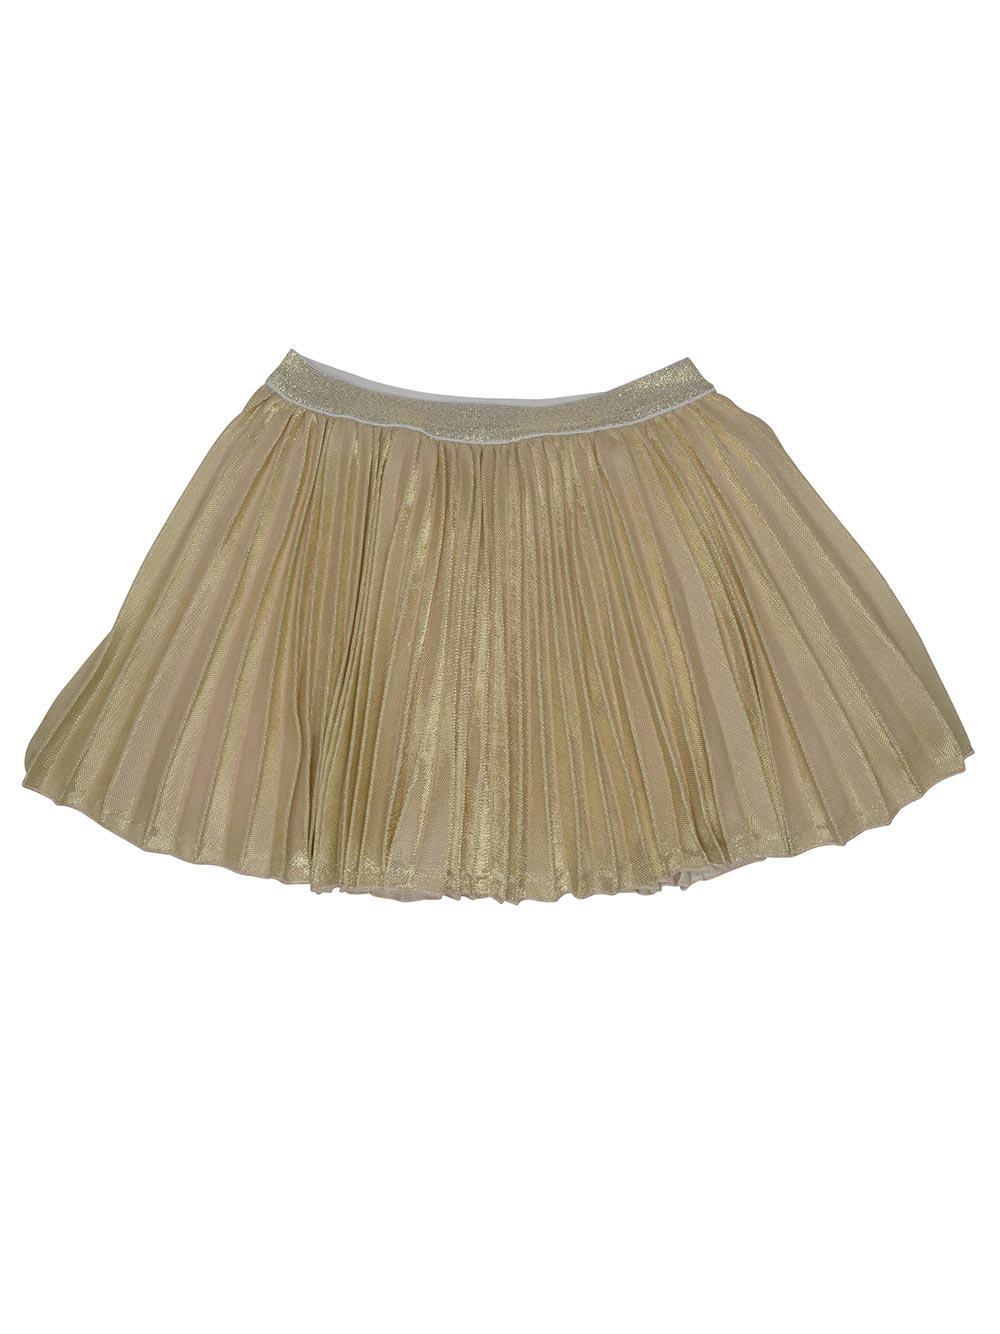 81b9ac0241344 Kate Mack Spun Gold Pleated Skirt Set Ivory Gold - little Boppers